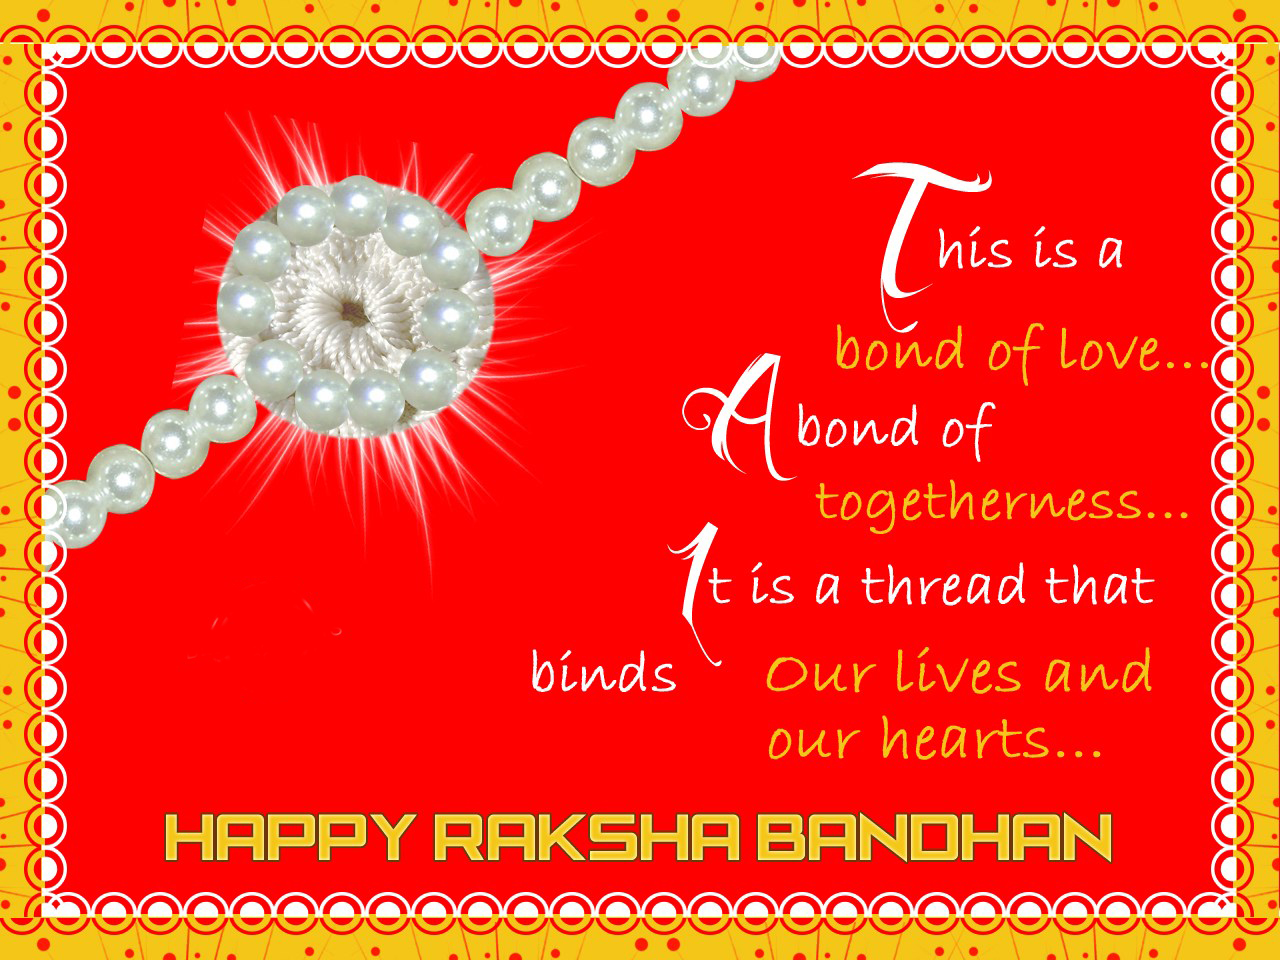 Happy raksha bandhan greeting cards brothers and sisters download raksha bandhan greeting cards kristyandbryce Choice Image